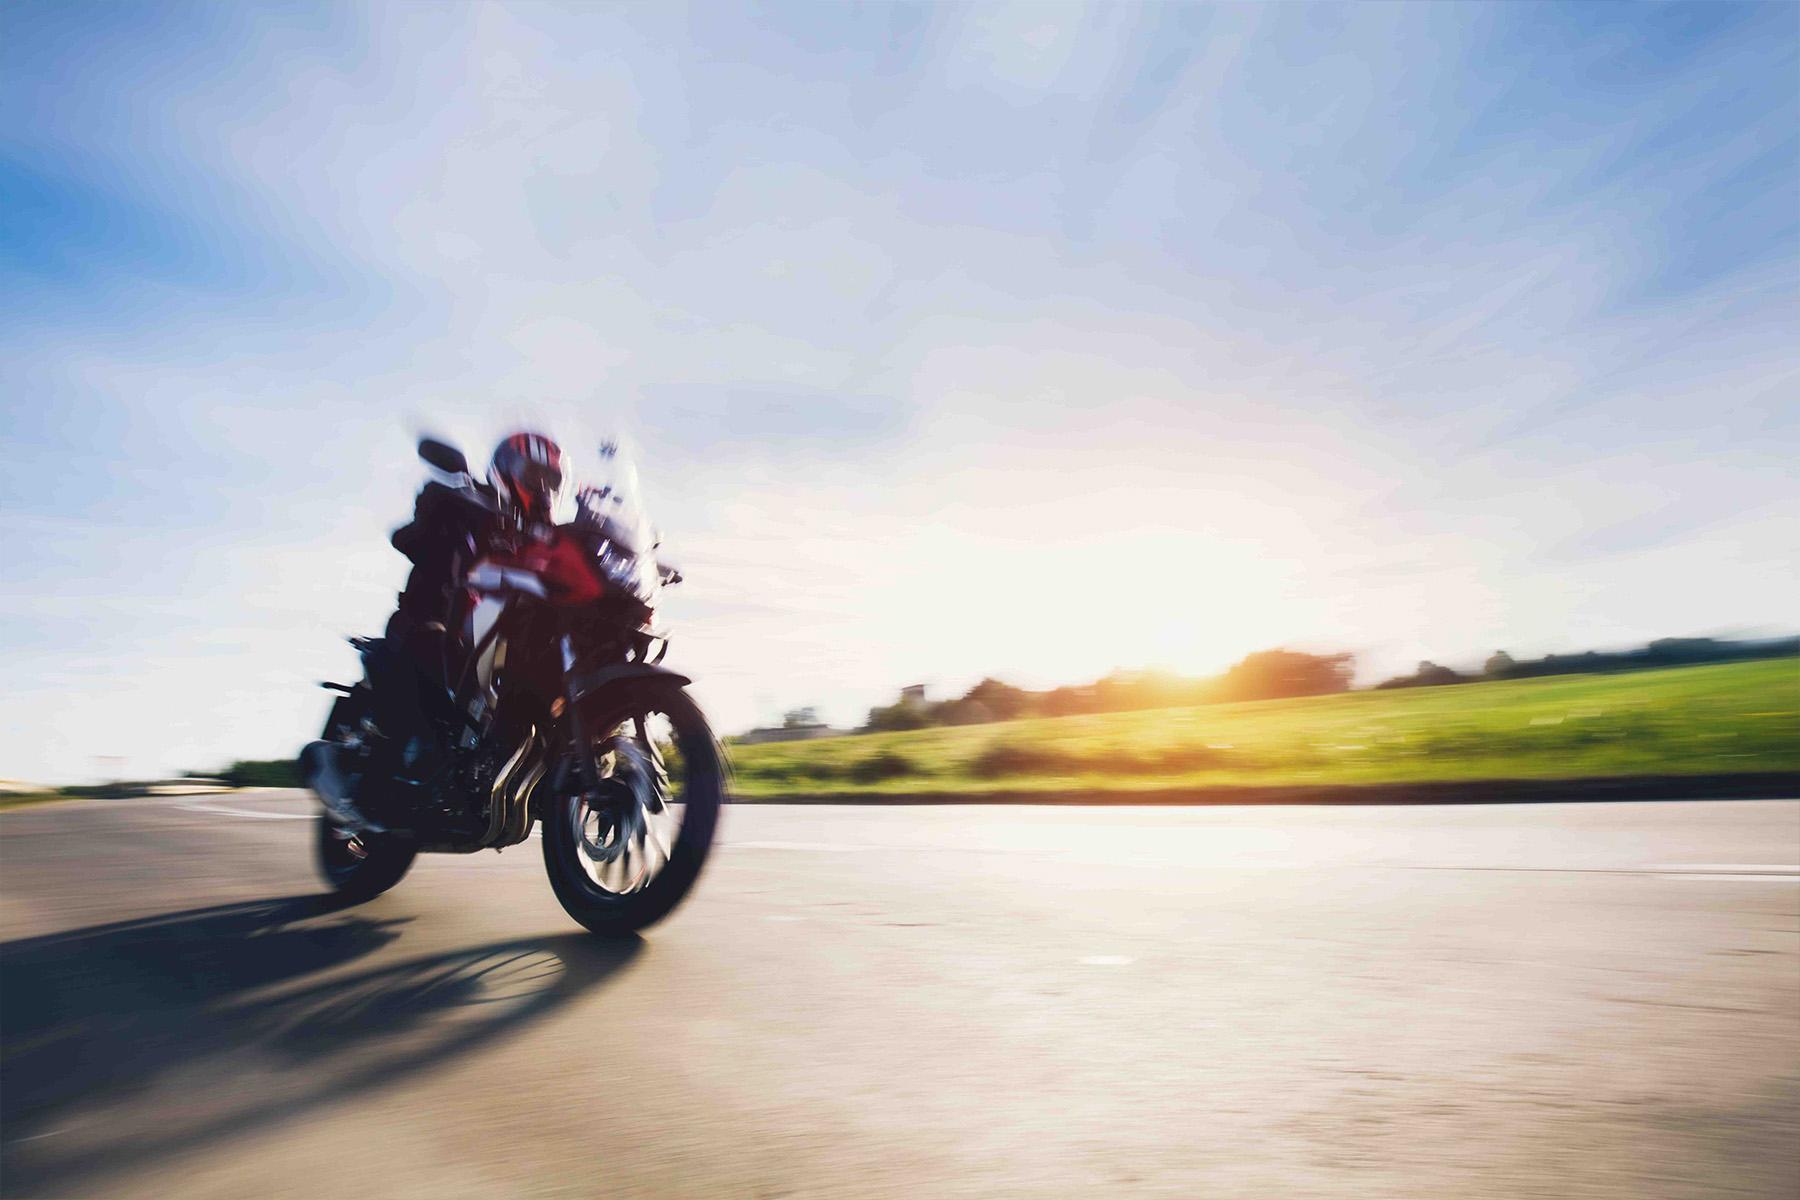 Motorcycle speeding down an open road.